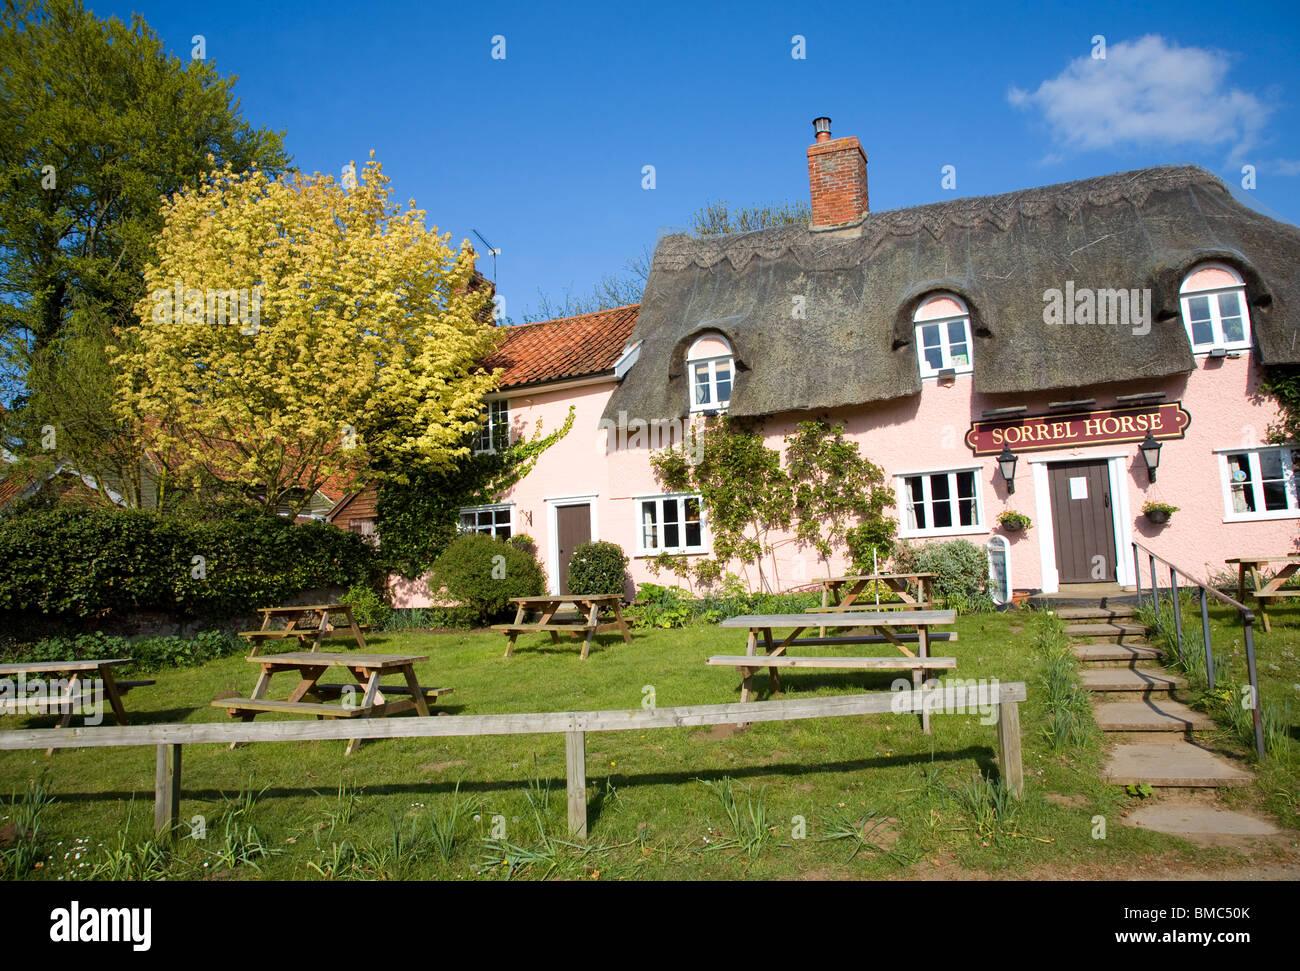 Sorrel Horse pub, Shottisham, Suffolk - Stock Image